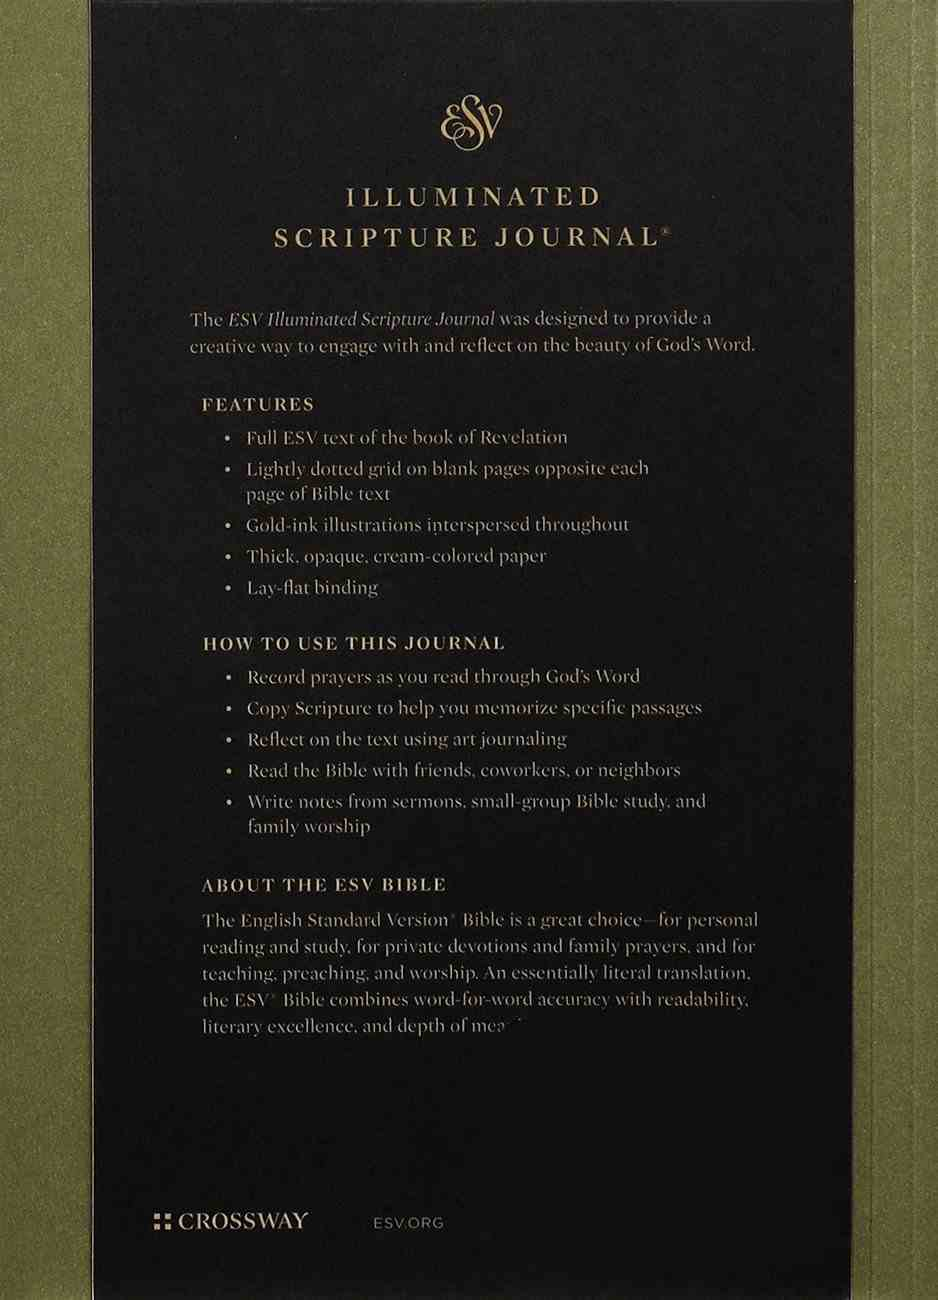 ESV Illuminated Scripture Journal Revelation (Black Letter Edition) Paperback